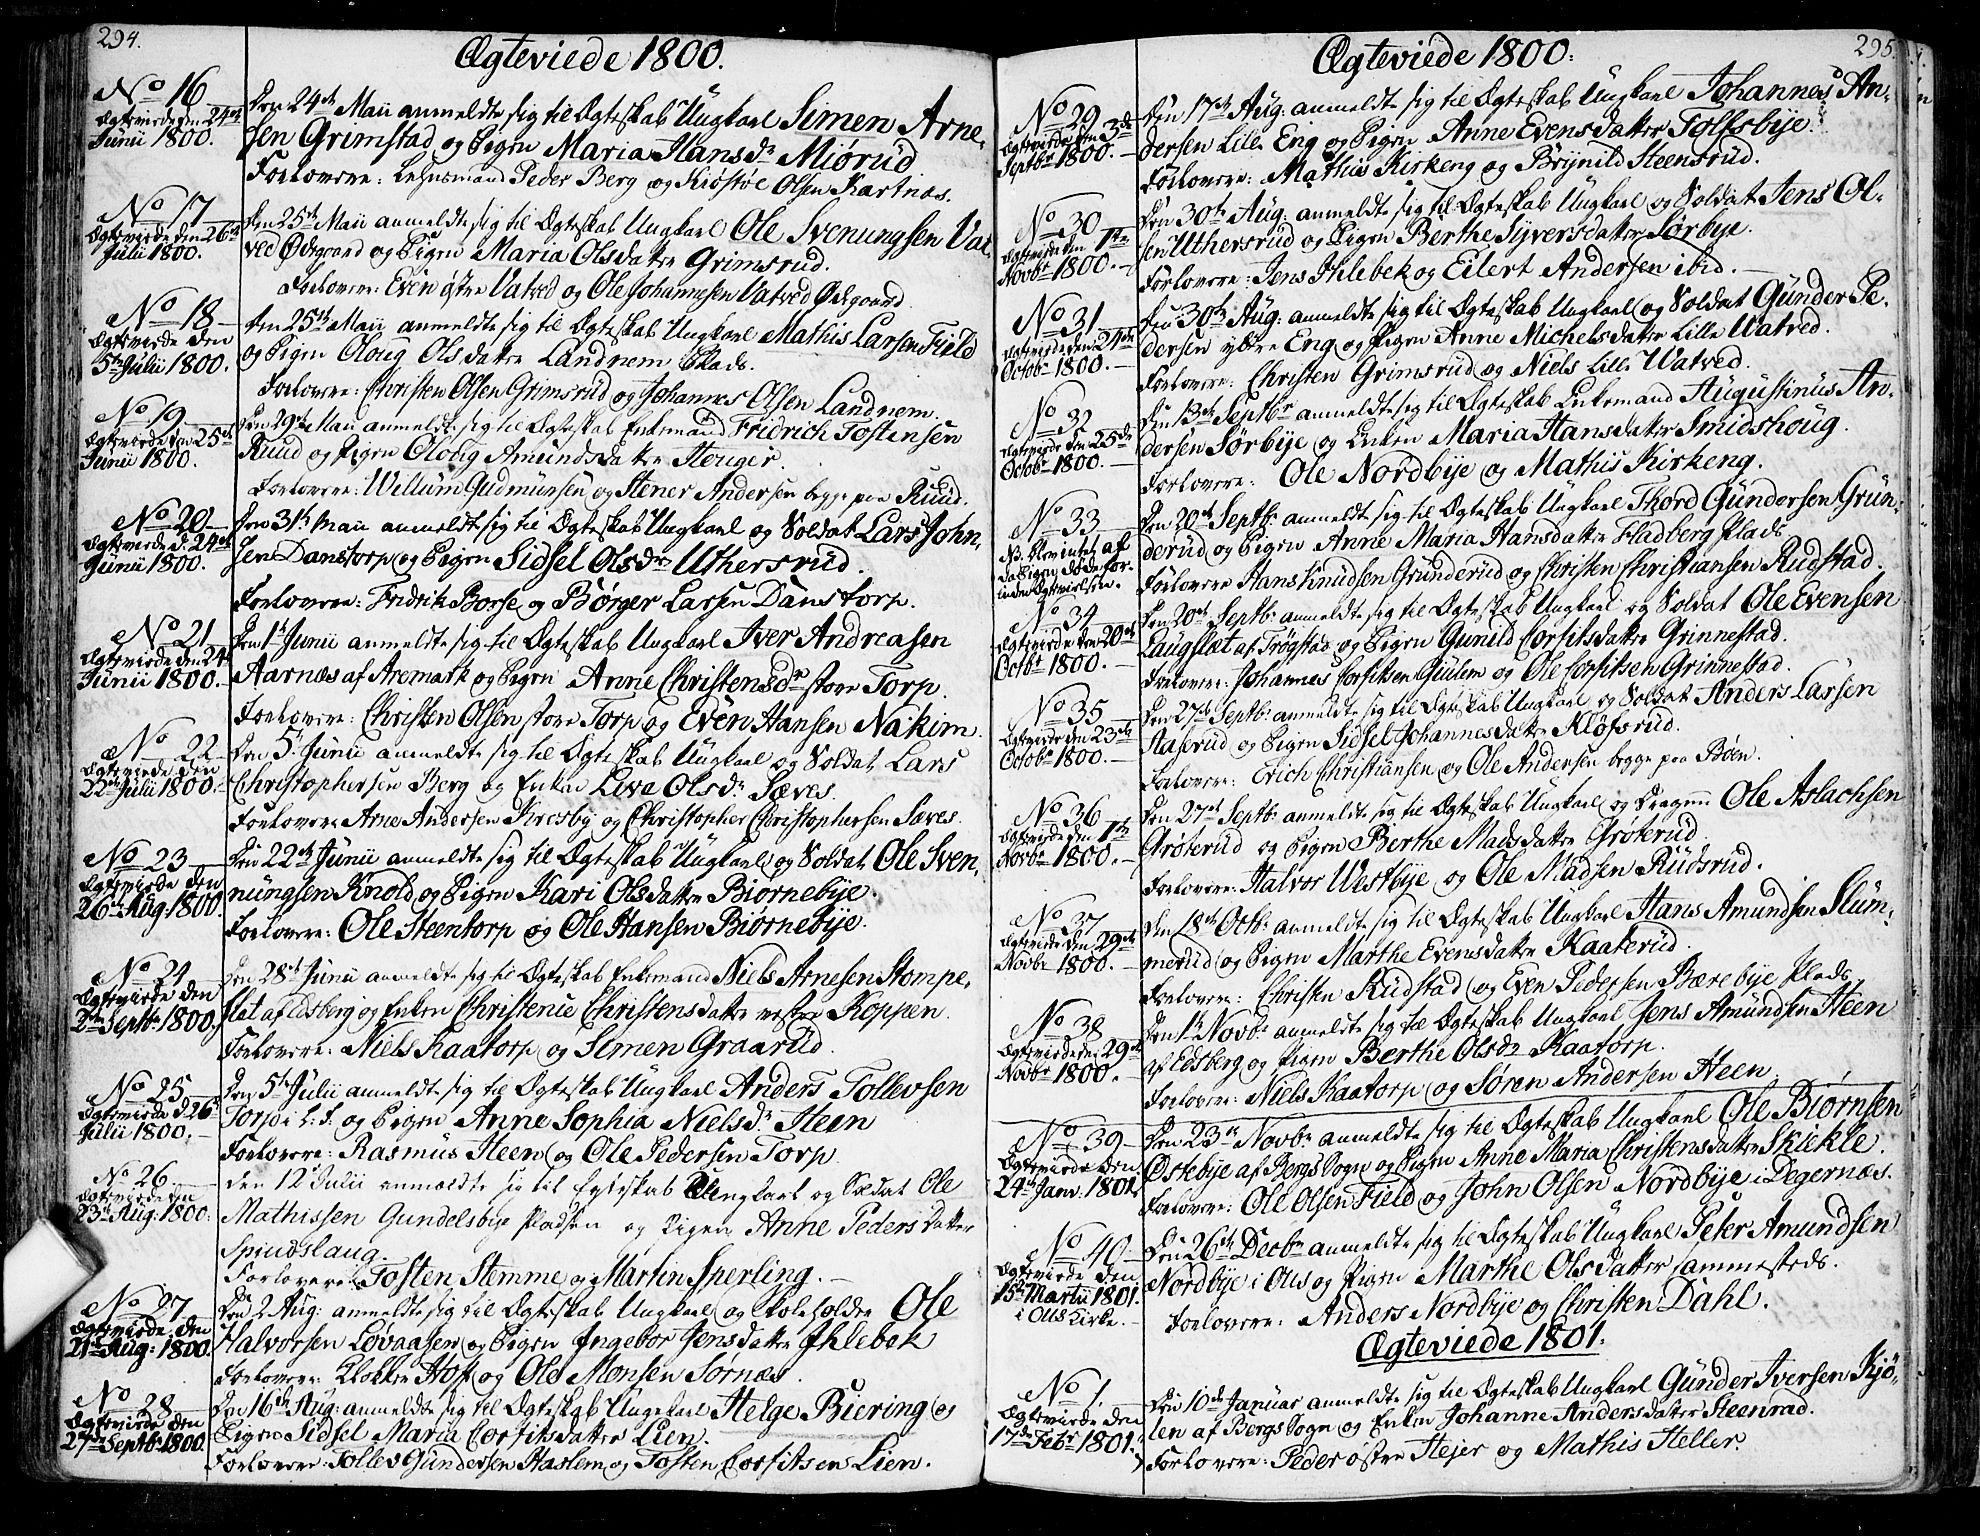 SAO, Rakkestad prestekontor Kirkebøker, F/Fa/L0005: Ministerialbok nr. I 5, 1784-1814, s. 294-295